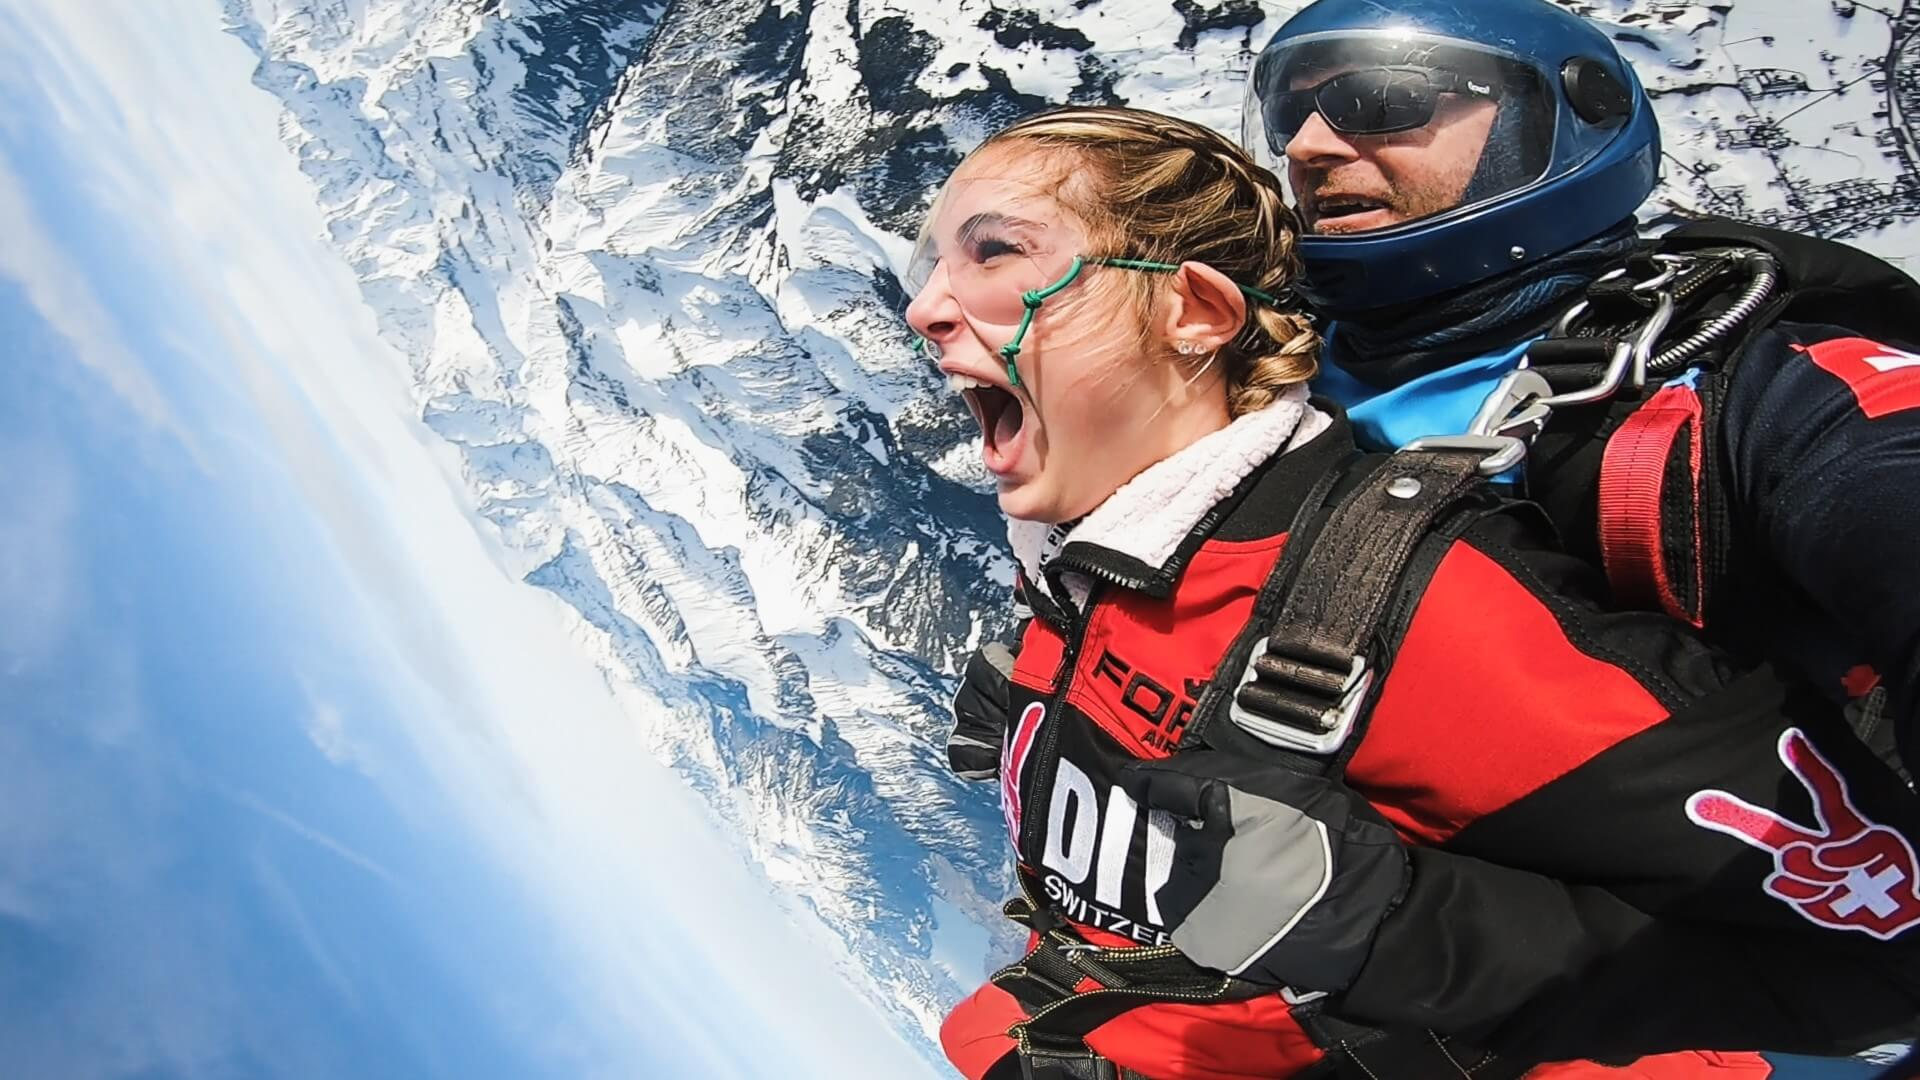 skydive-switzerland-sprung-winter-upsidedown